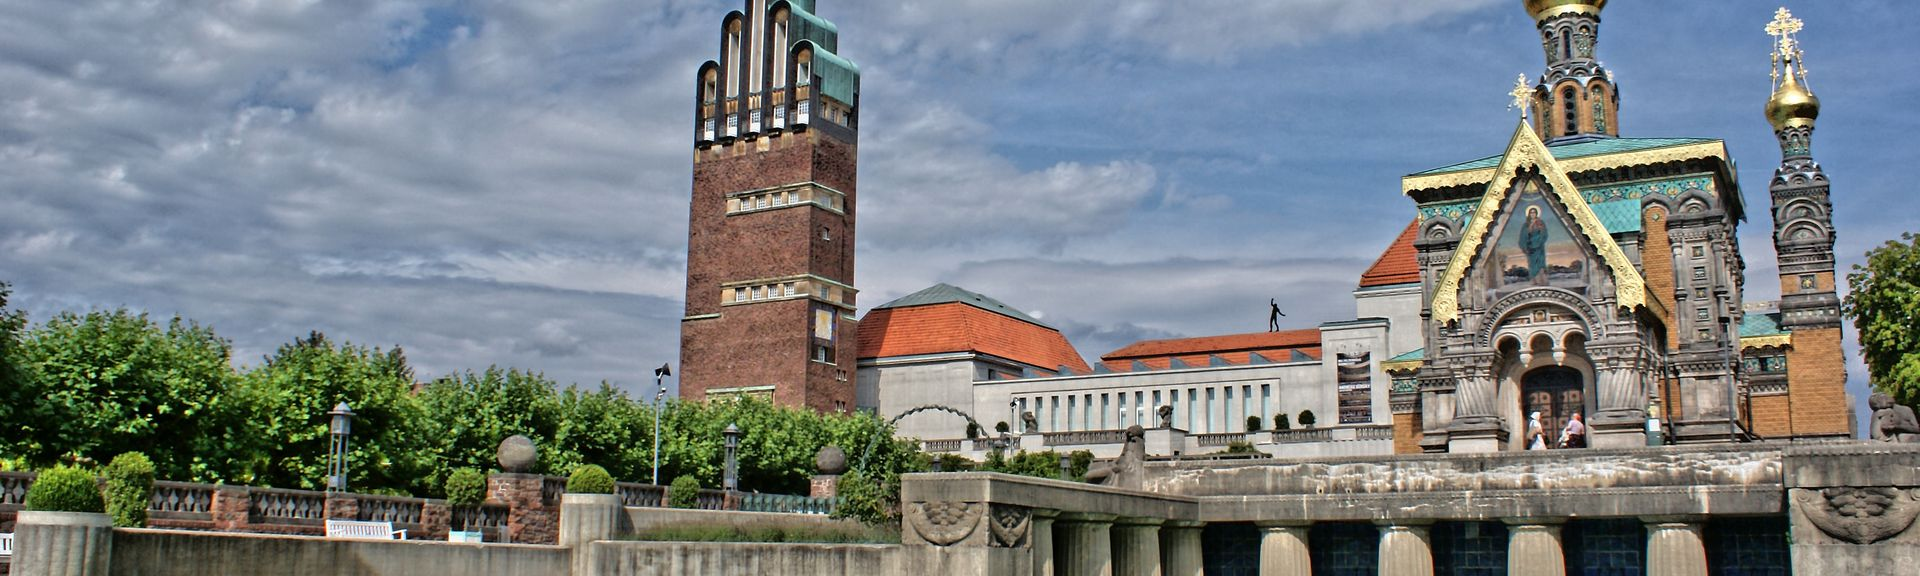 Laudenbach, Germany